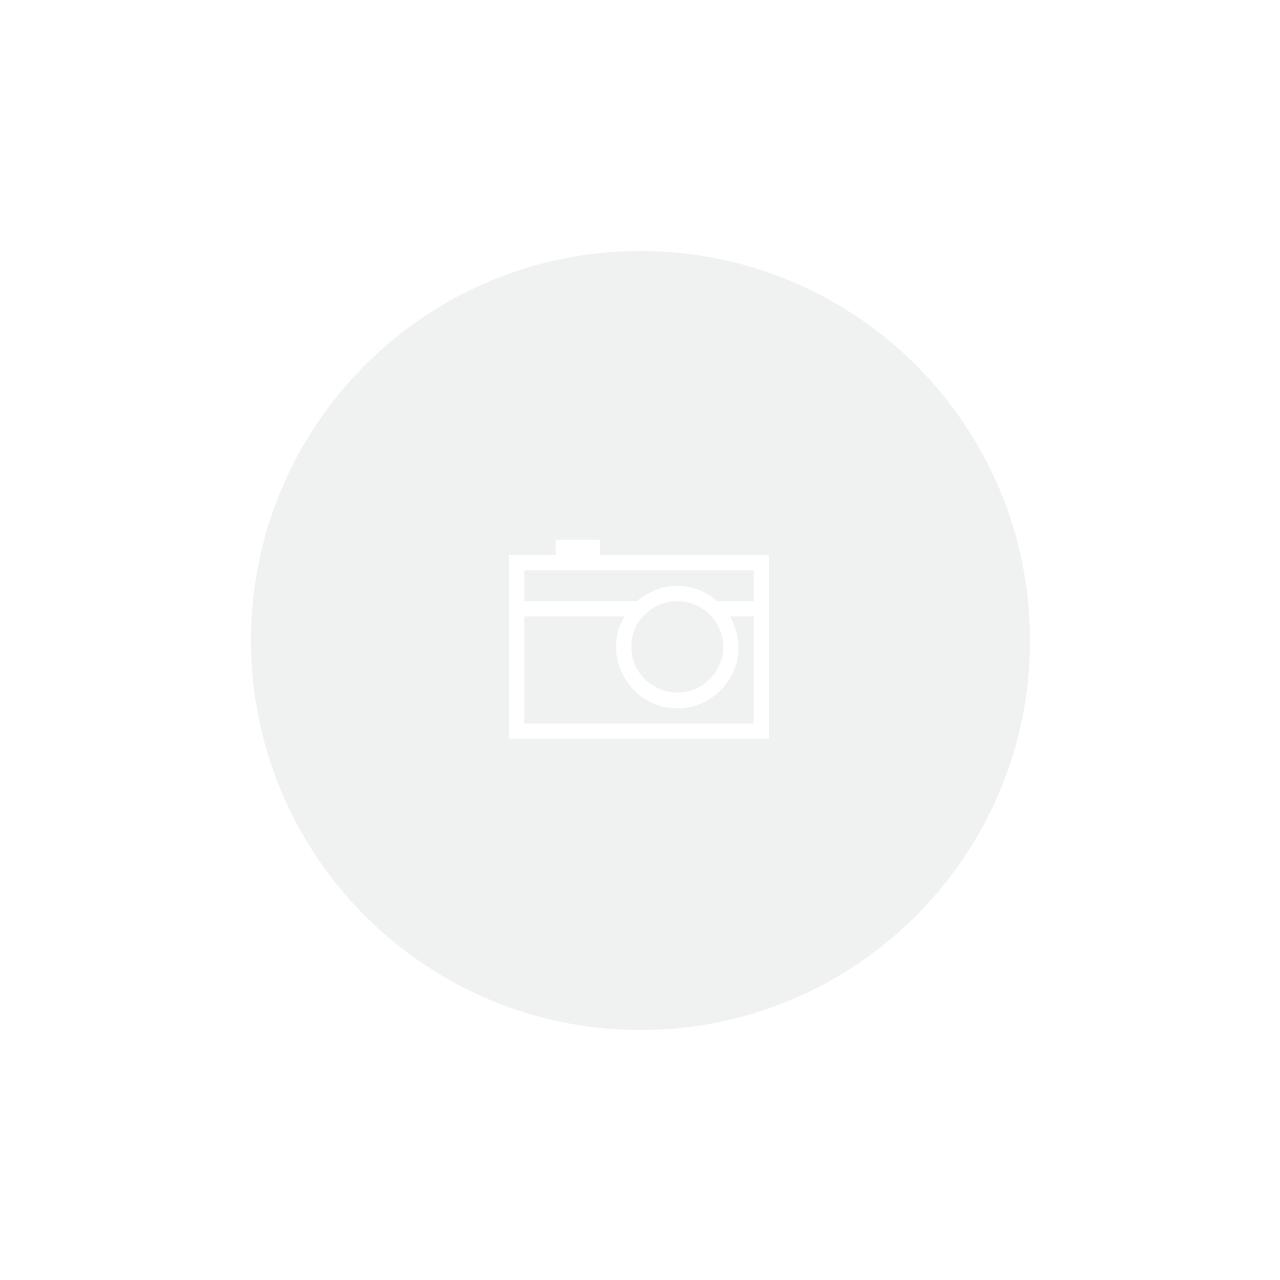 Papel Artesanal Indiano - Ref. 46